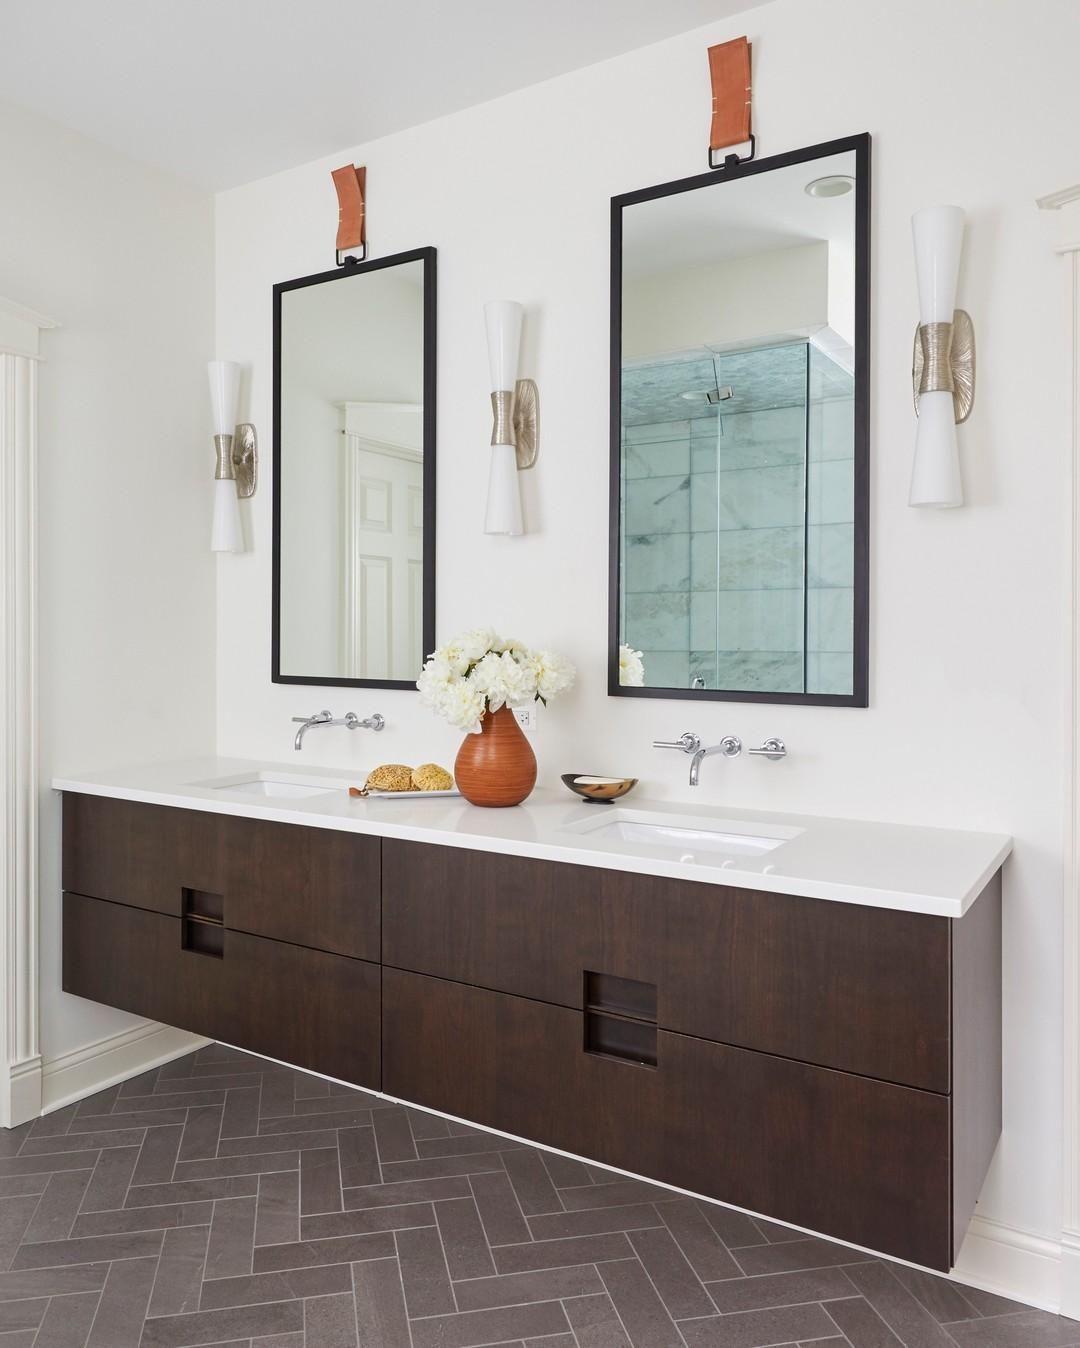 Utopia Large Double Bath Sconce Bathroom Inspiration Modern Bathroom Remodel Master Master Bathroom Decor [ 1348 x 1080 Pixel ]